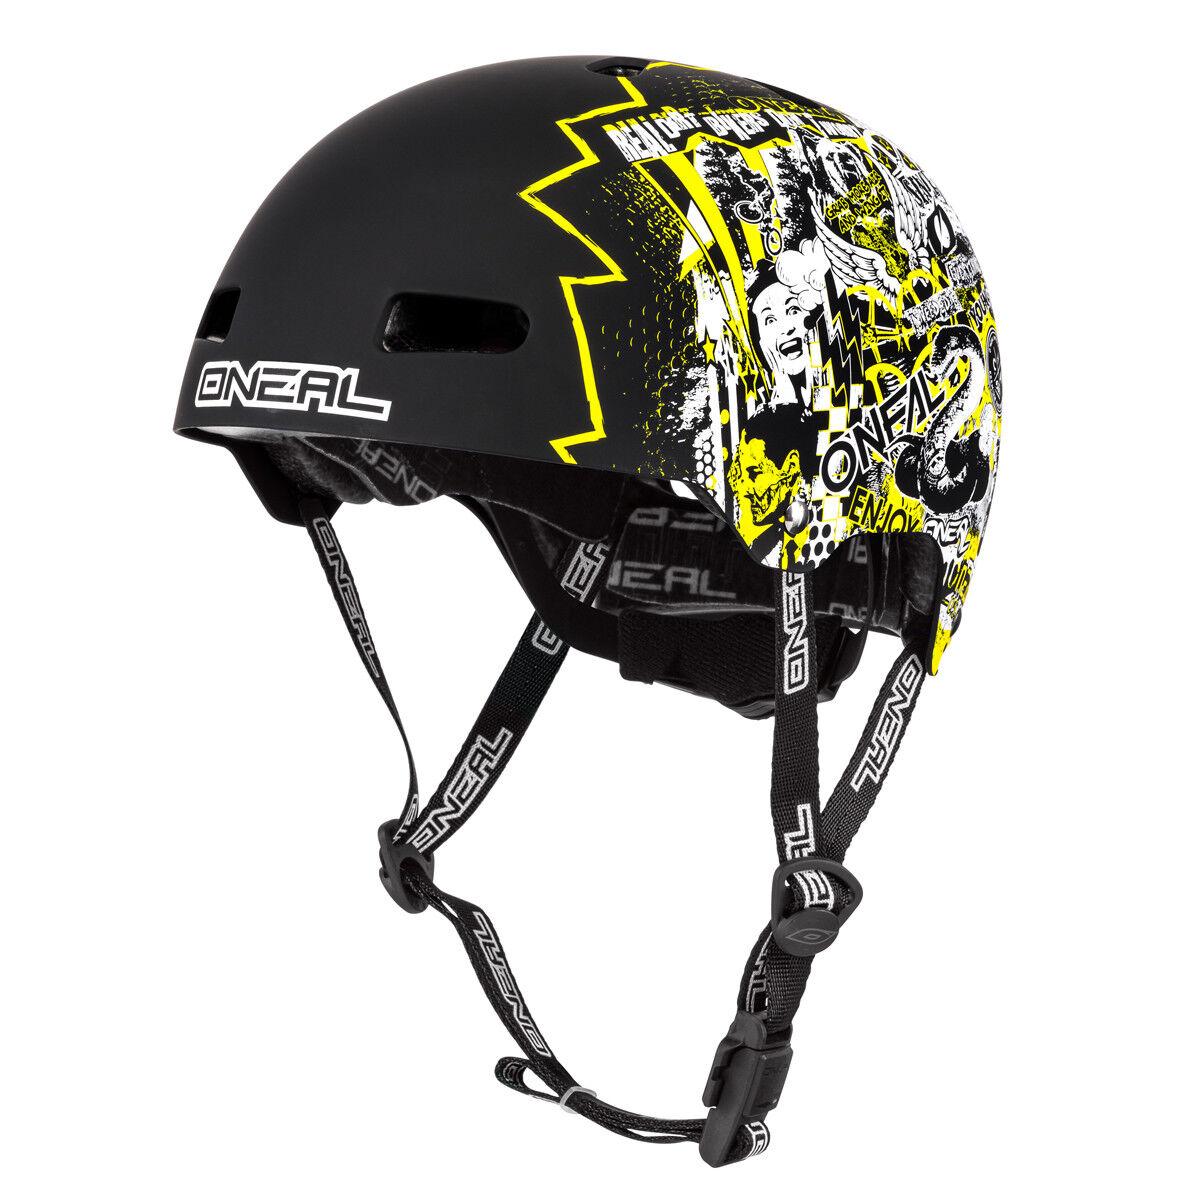 O'neal Lid ZF Rift Dirt   BMX Fahrrad Helm black white yellow 2019 Oneal